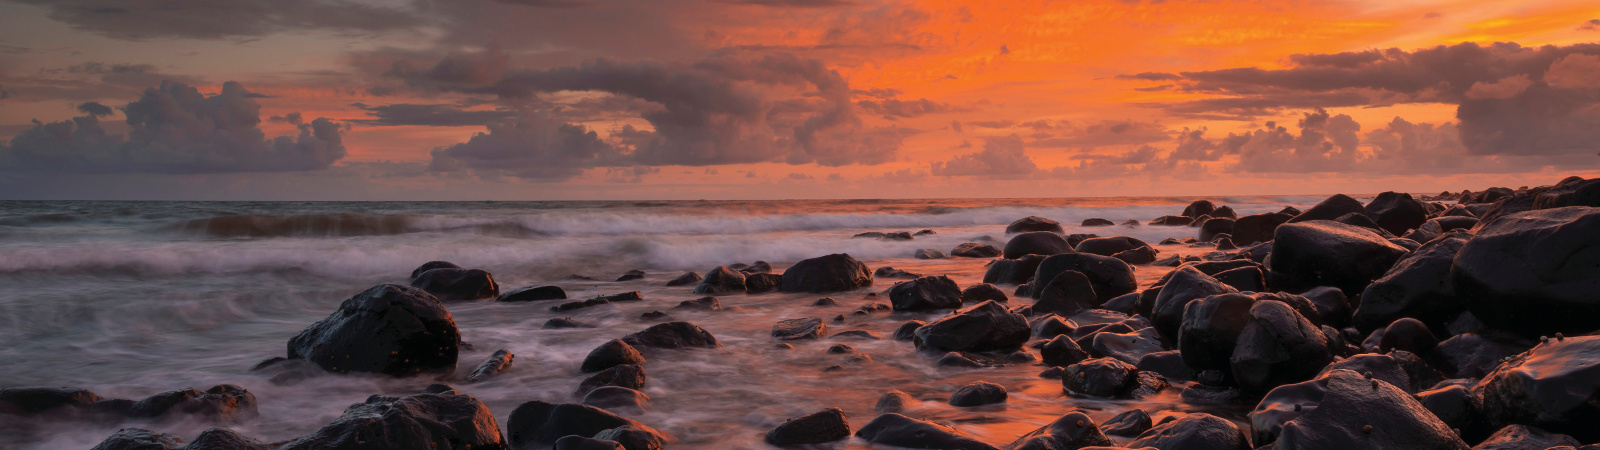 Bundaberg and Hervey Bay